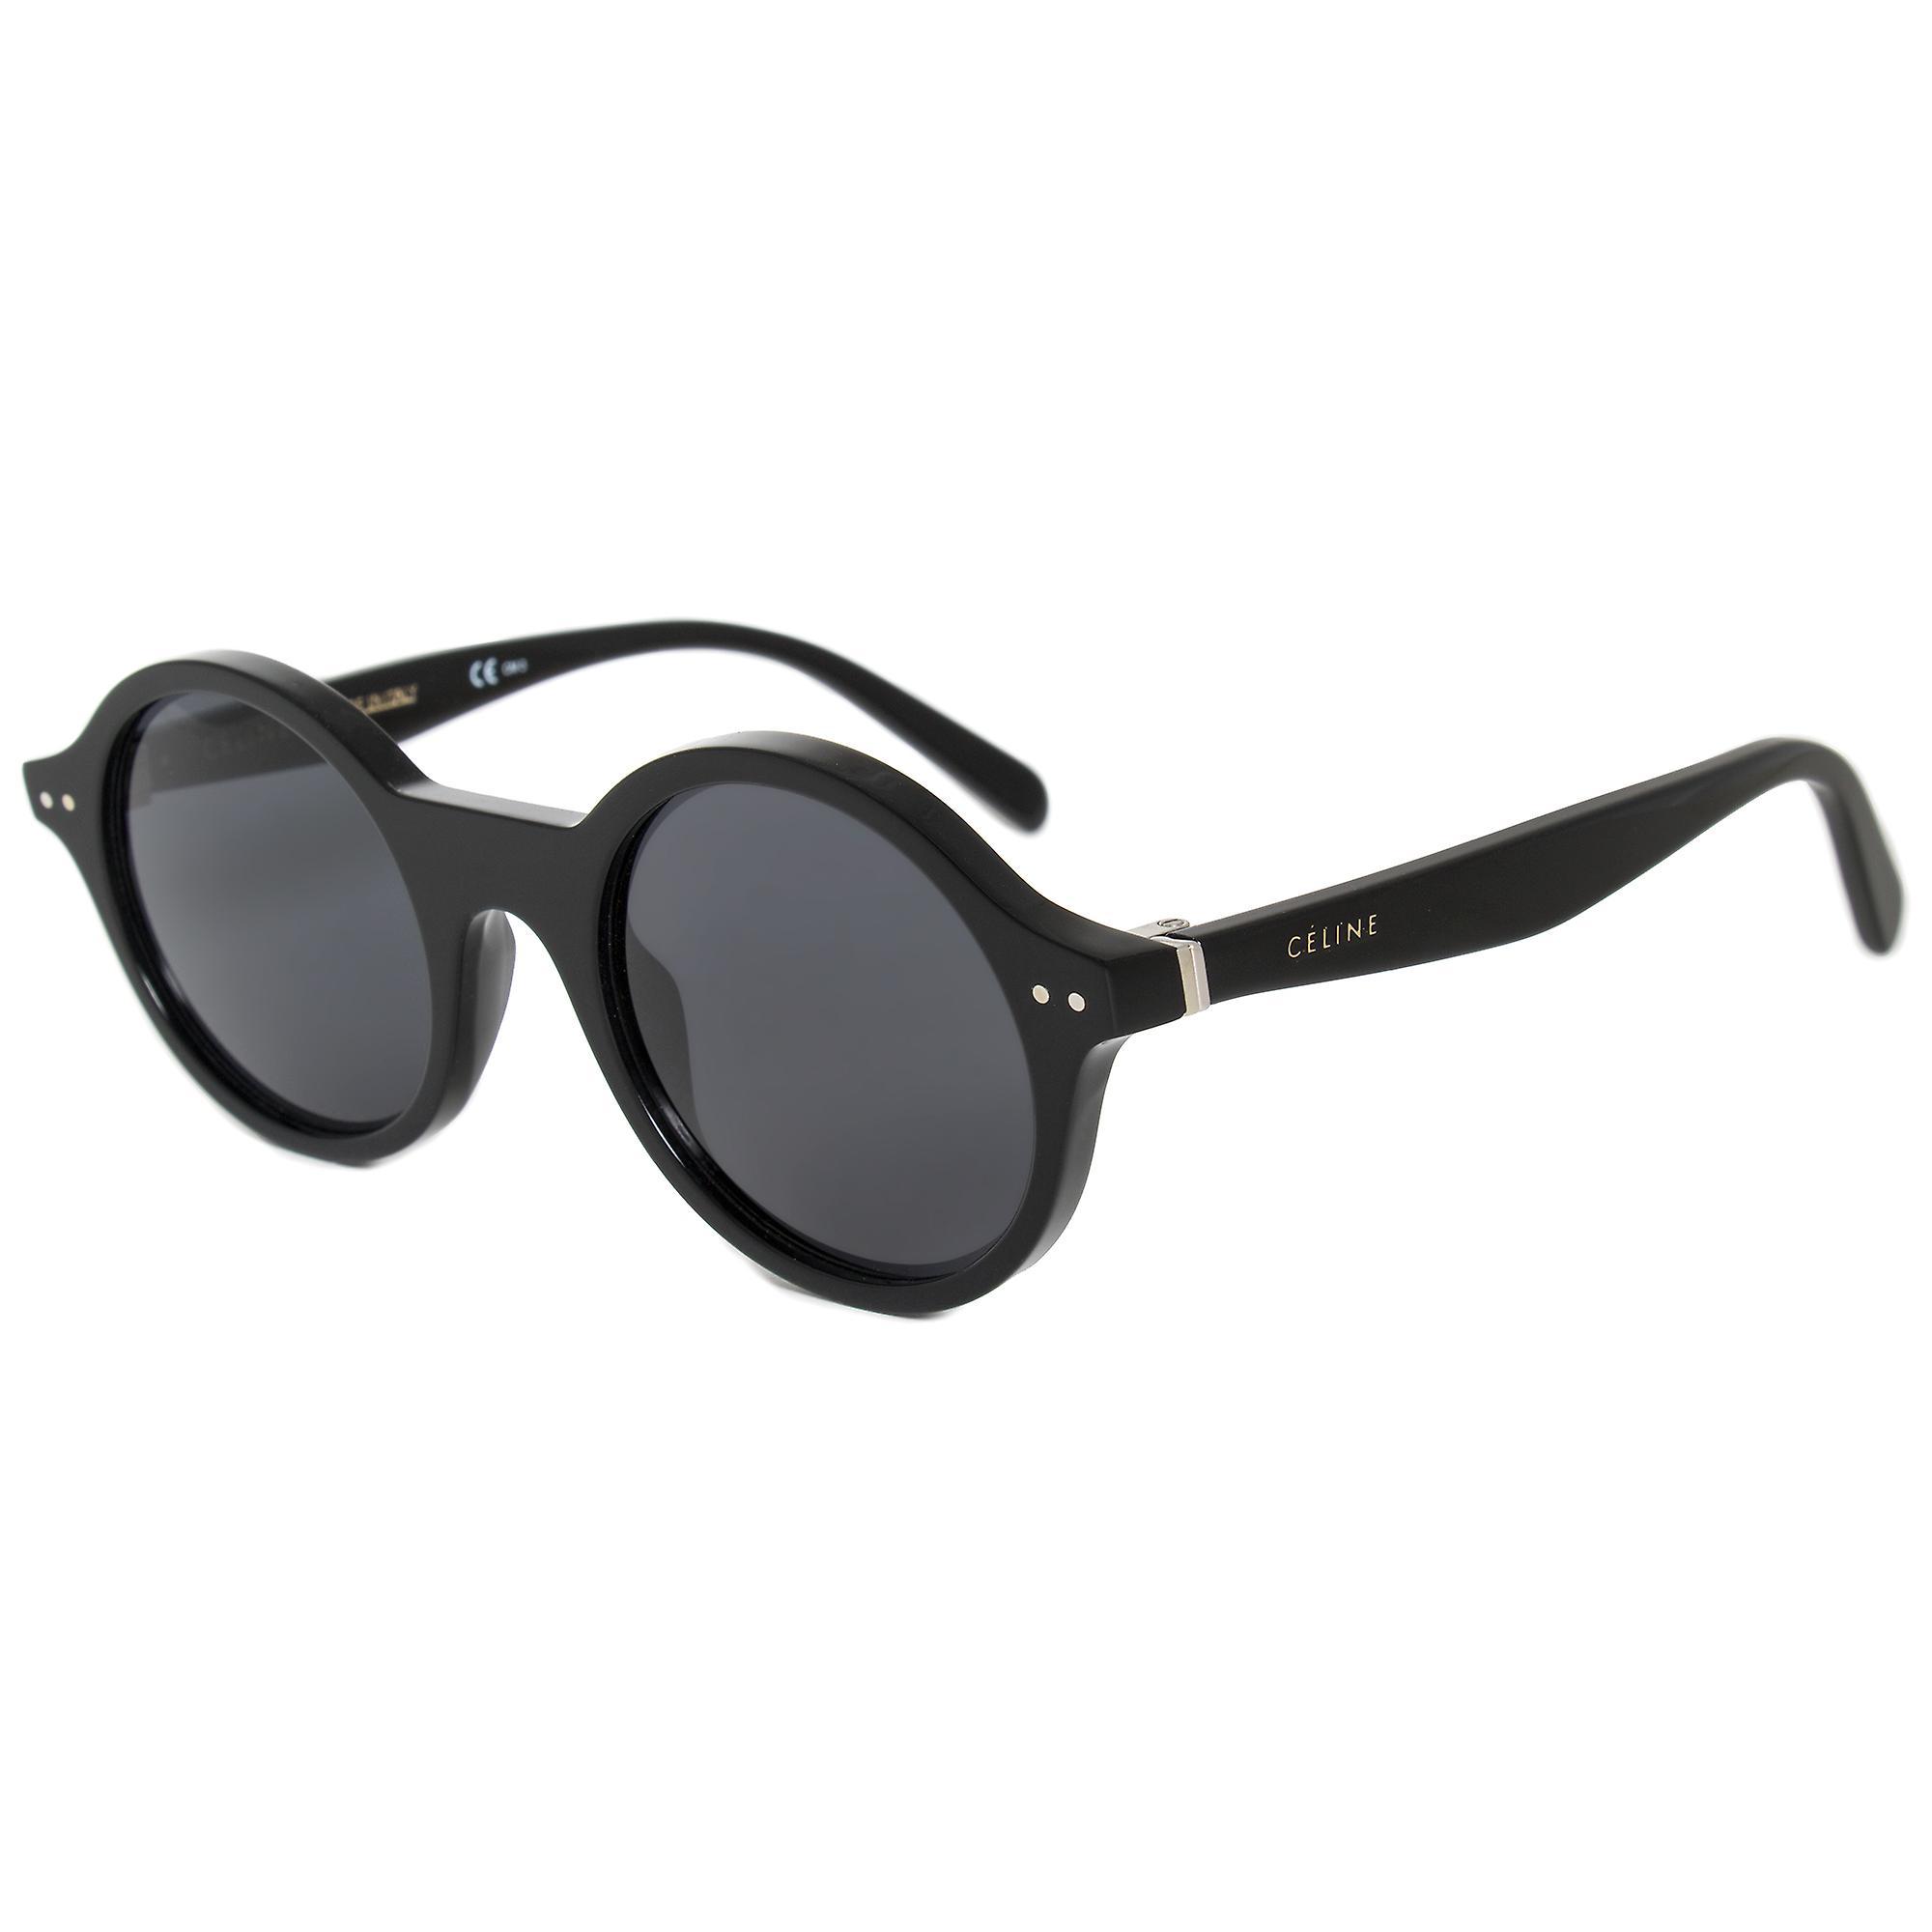 Celine Round Sunglasses 41434S 807 IR 48